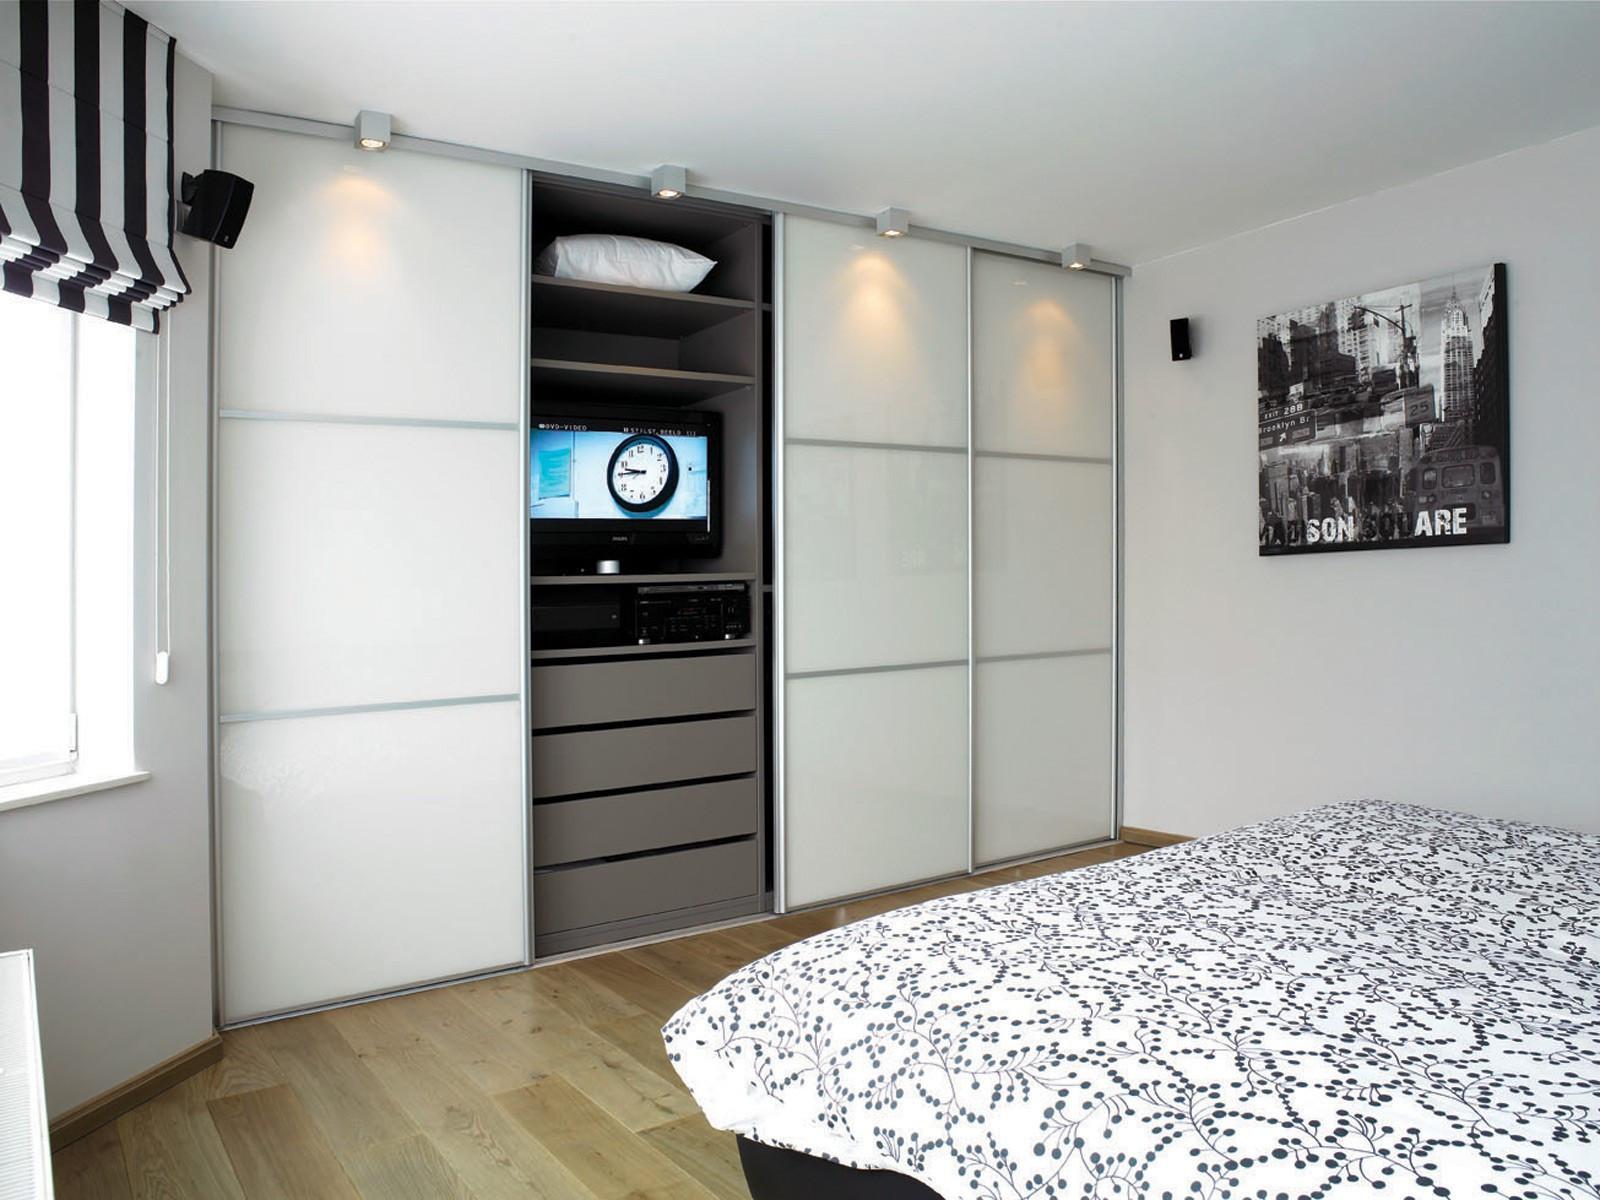 slaapkamerkasten op maat › kastid  kasten, meubelen, dressings, Meubels Ideeën